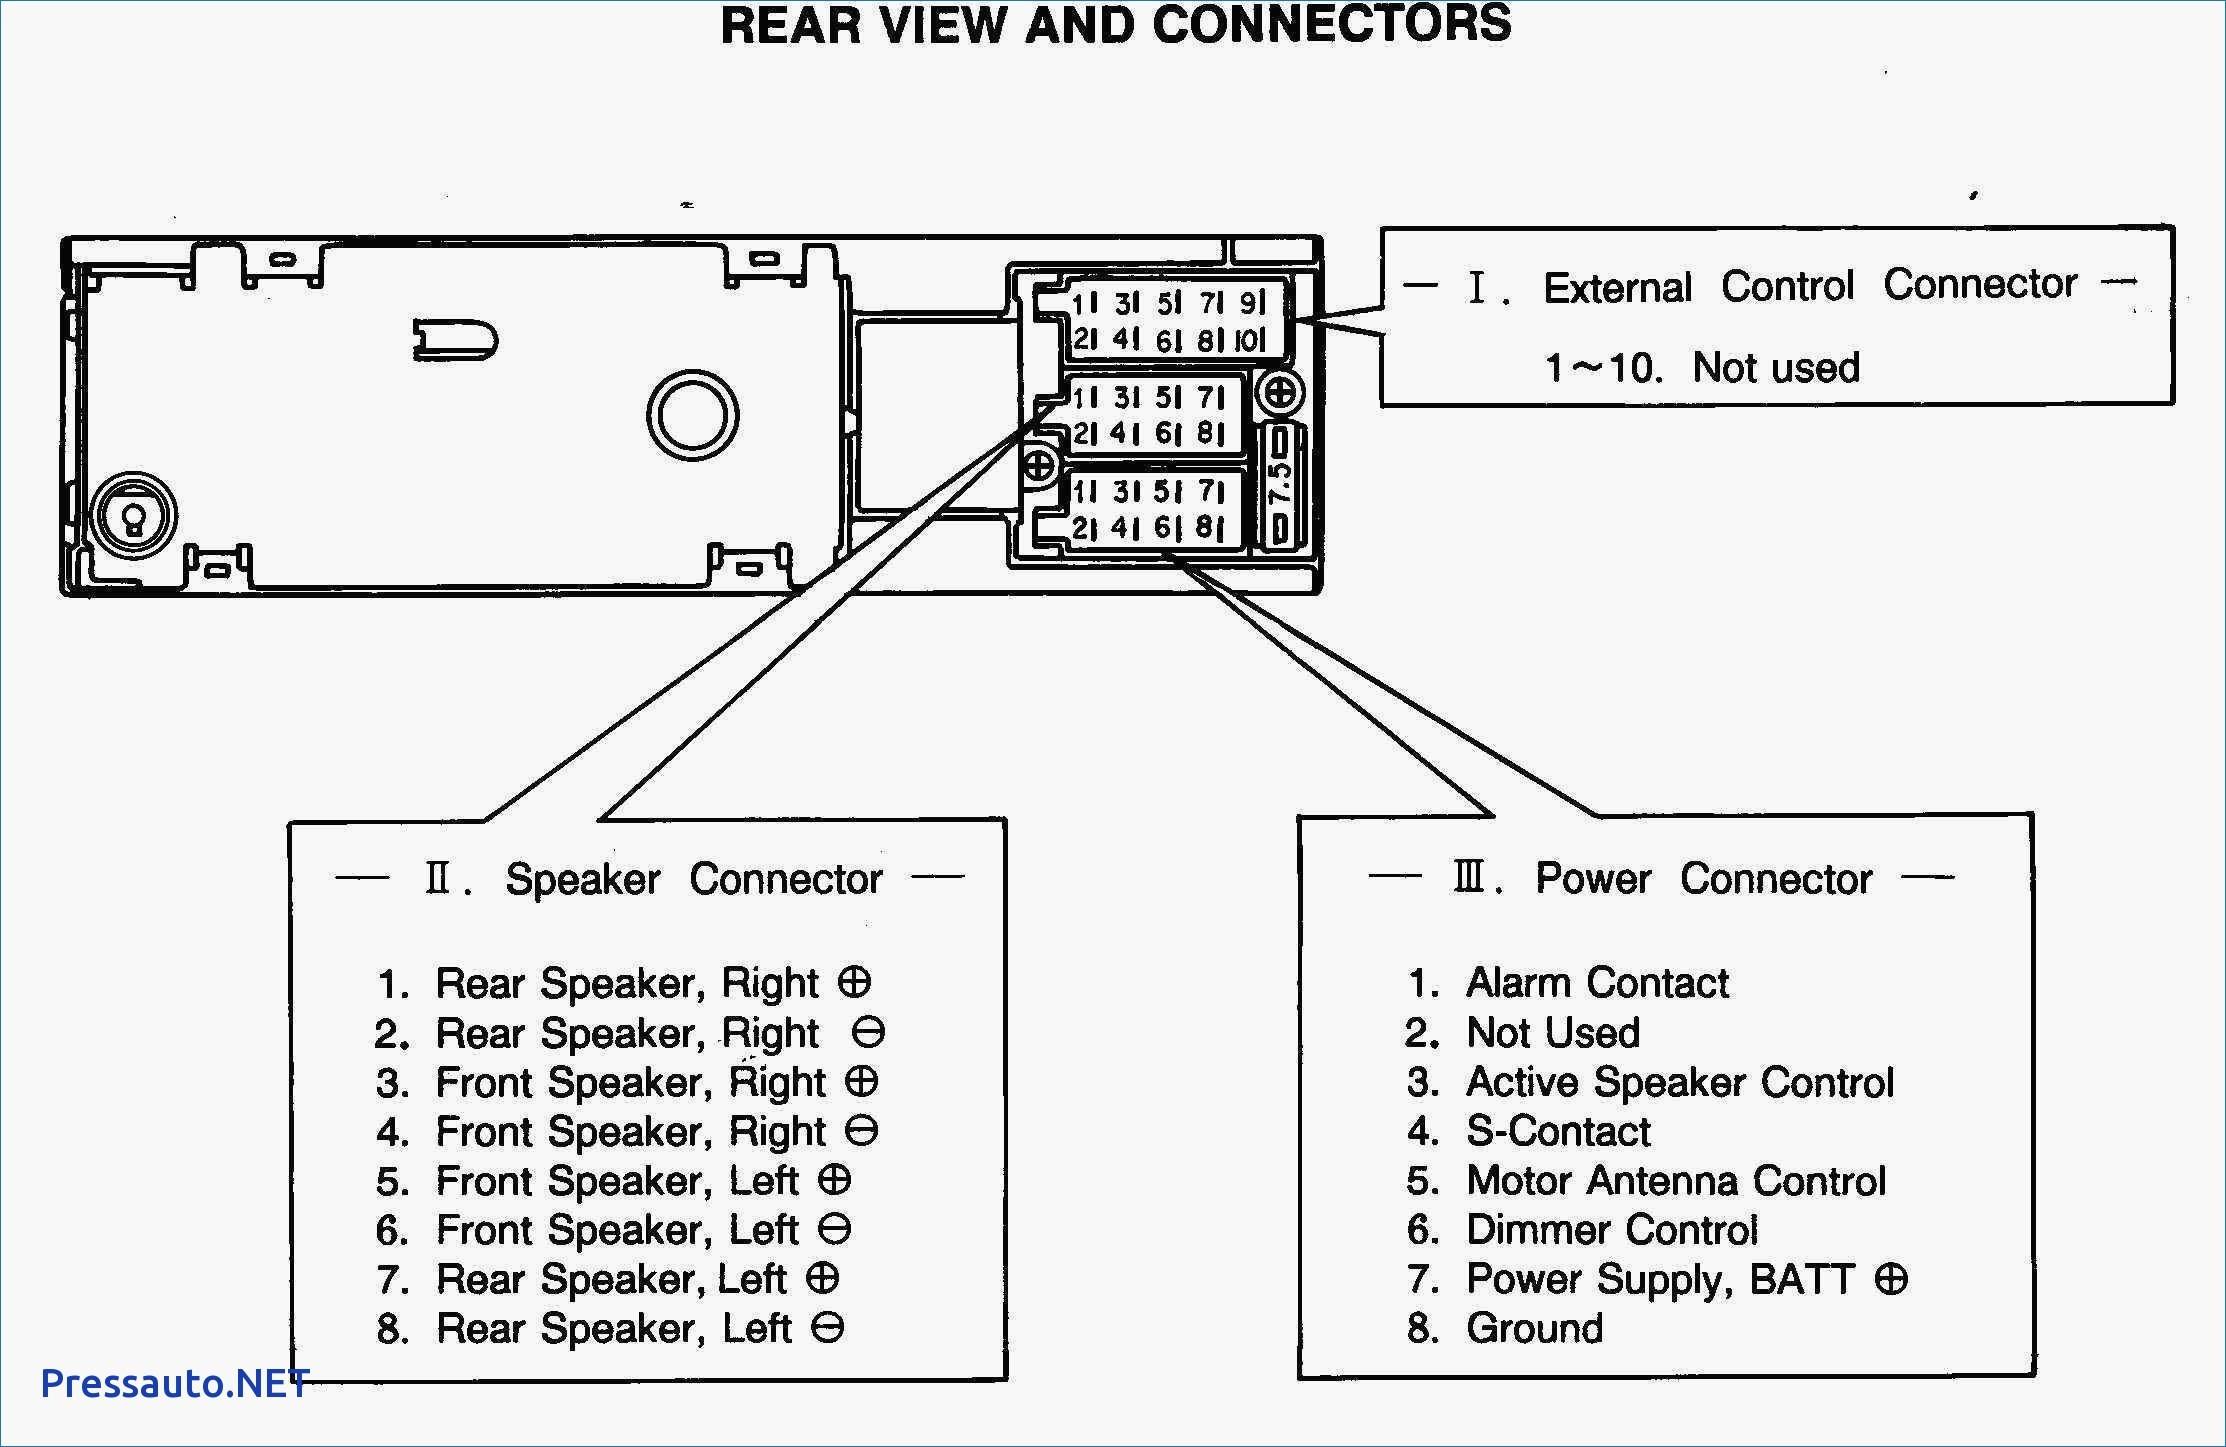 Car sound System Setup Diagram Car Diagram Awesome Kenwood Car Audio ...